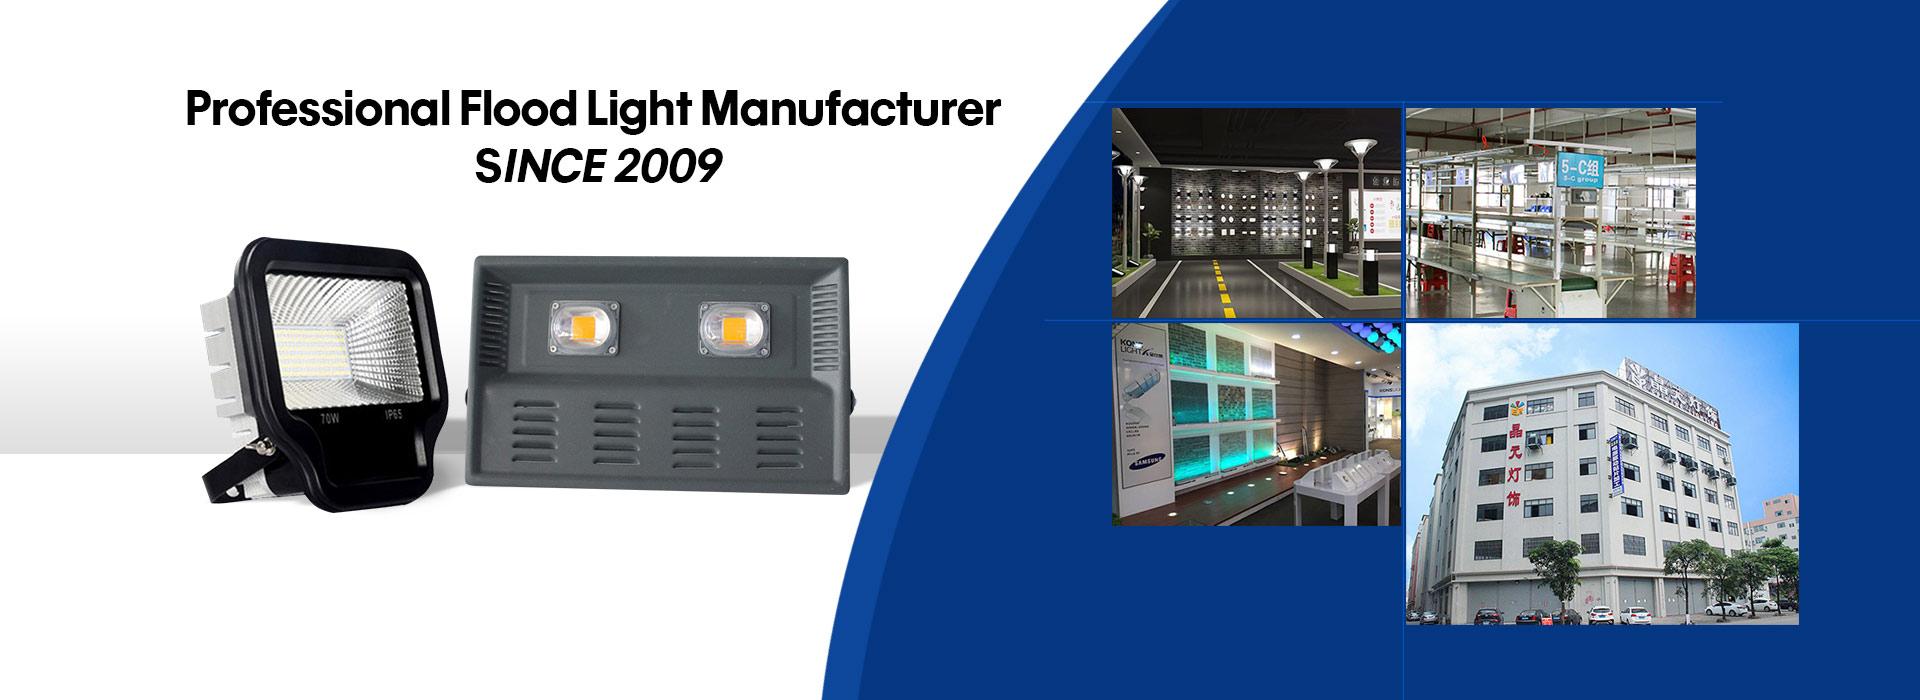 led flood light manufacturers, led flood light suppliers, led flood light china, led flood light distributor